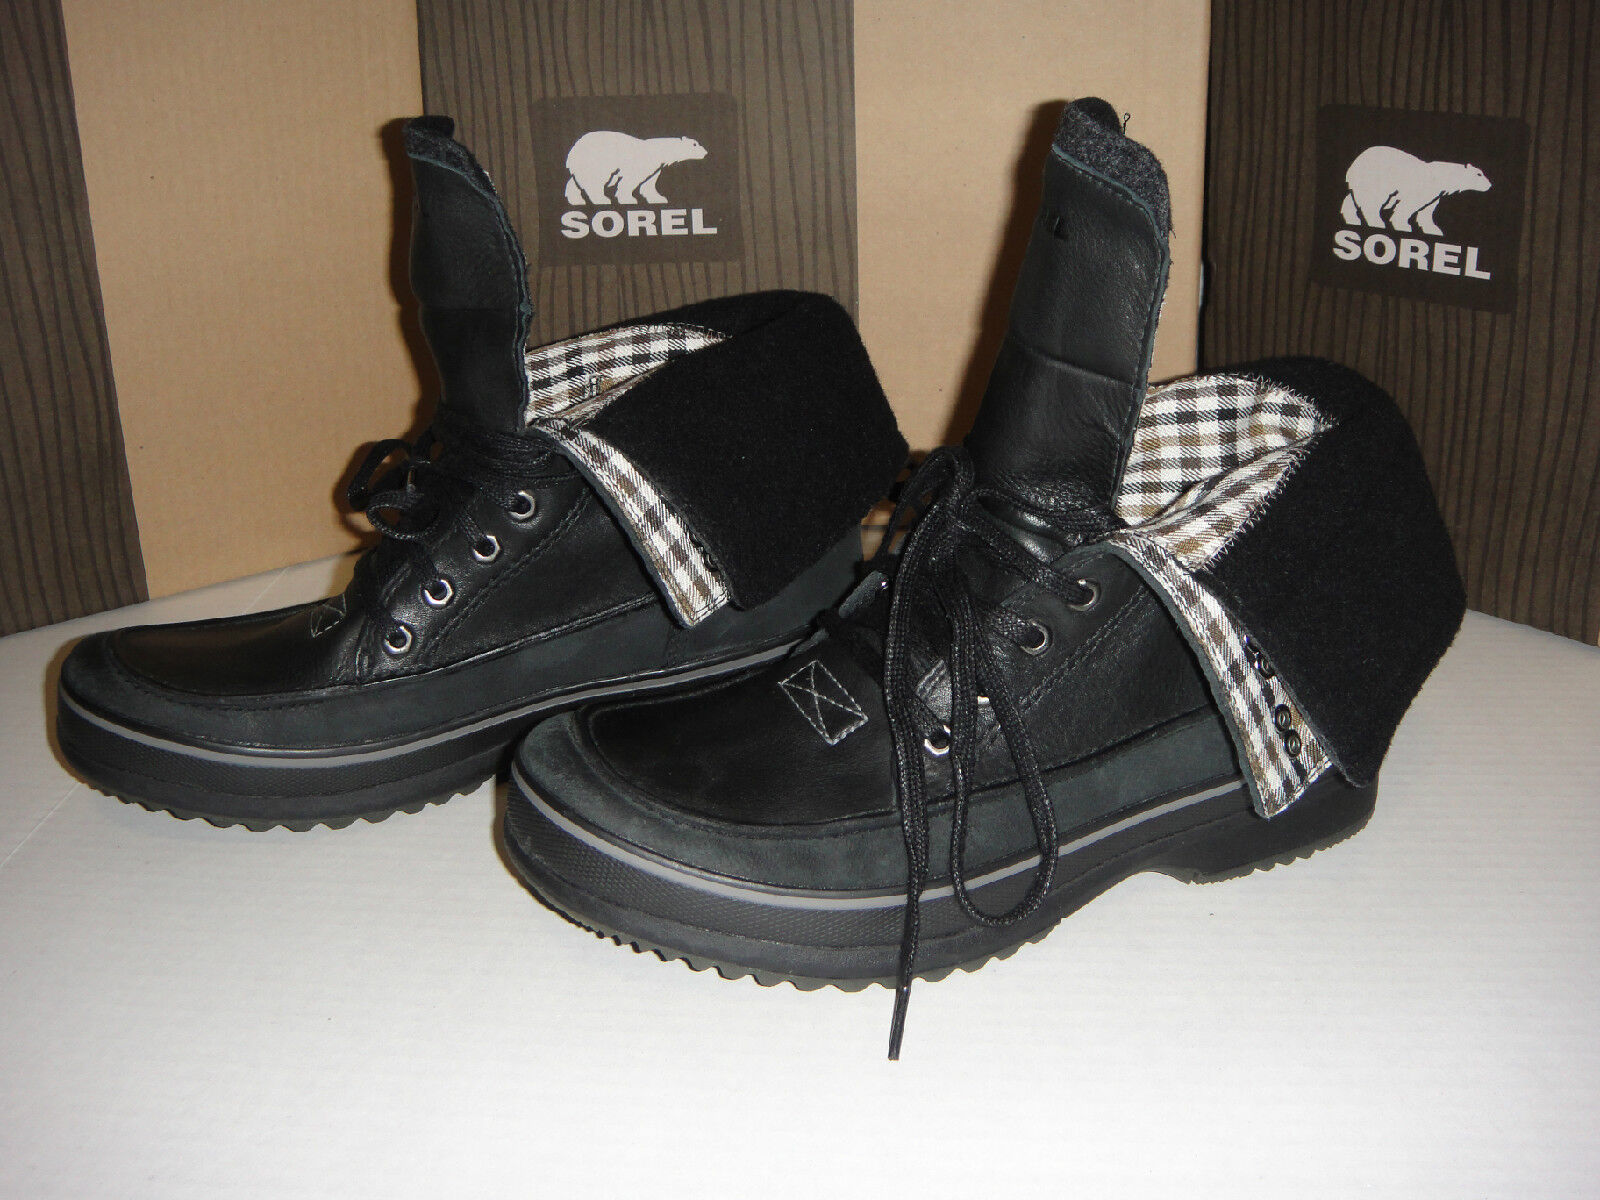 NEW SOREL KINGSTONE PEAK  Boot Leather/Nubuck Black/DarkNavy size 11 D